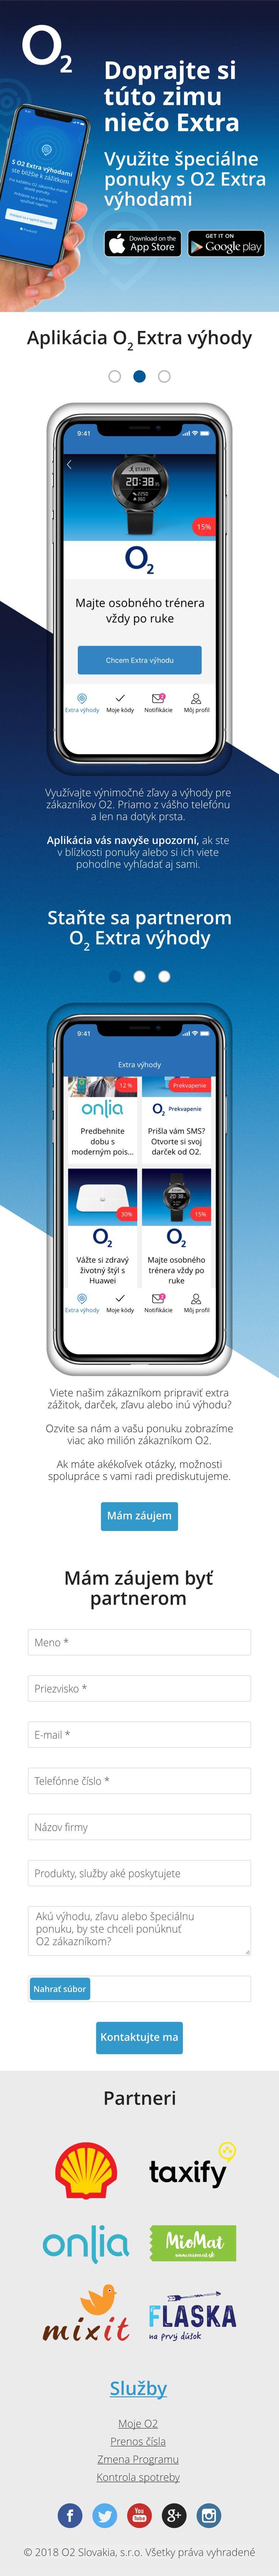 o2 microsite for smartphone